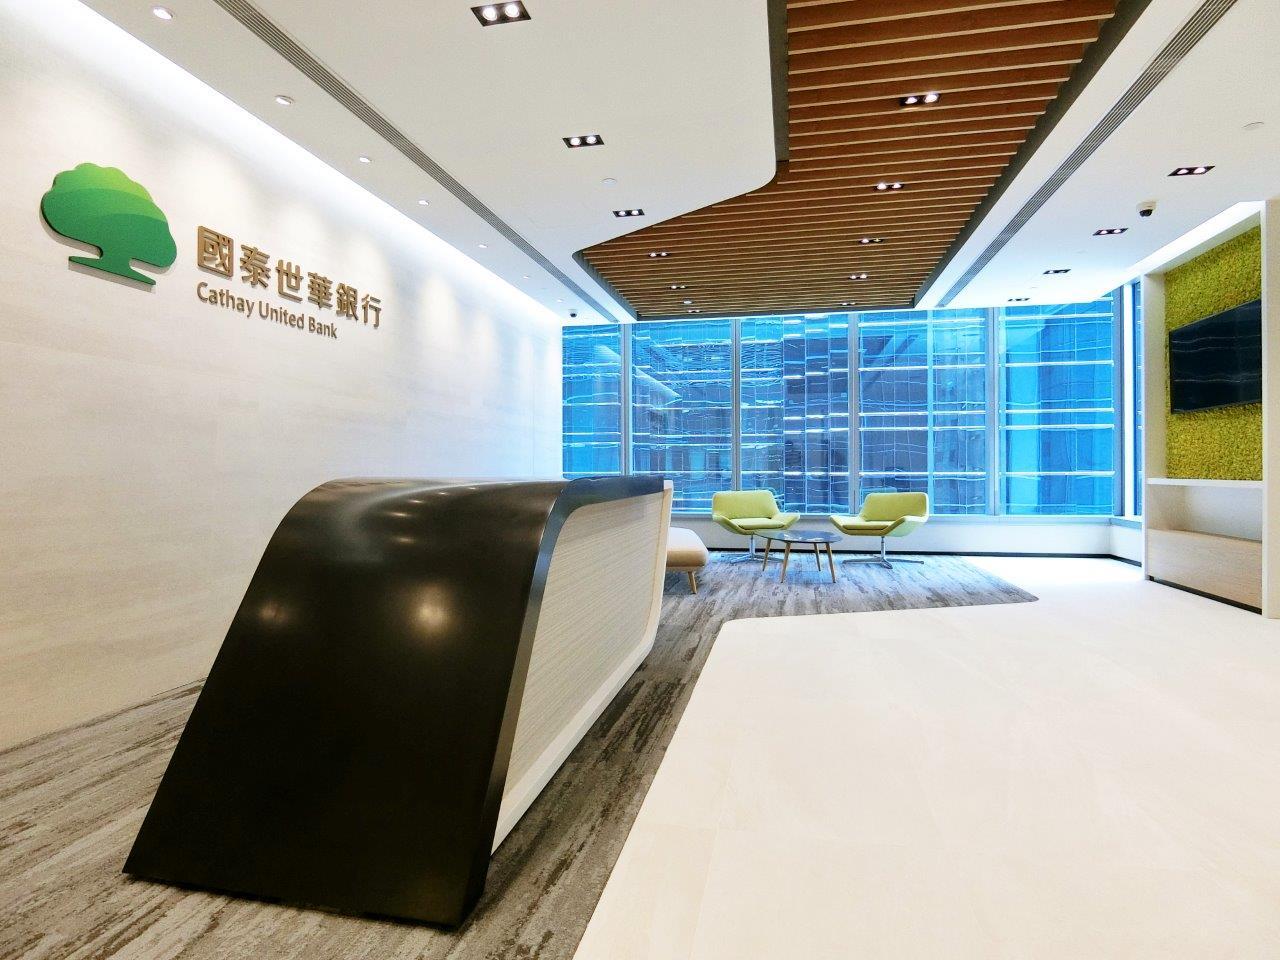 Ngân hàng Cathay United Bank